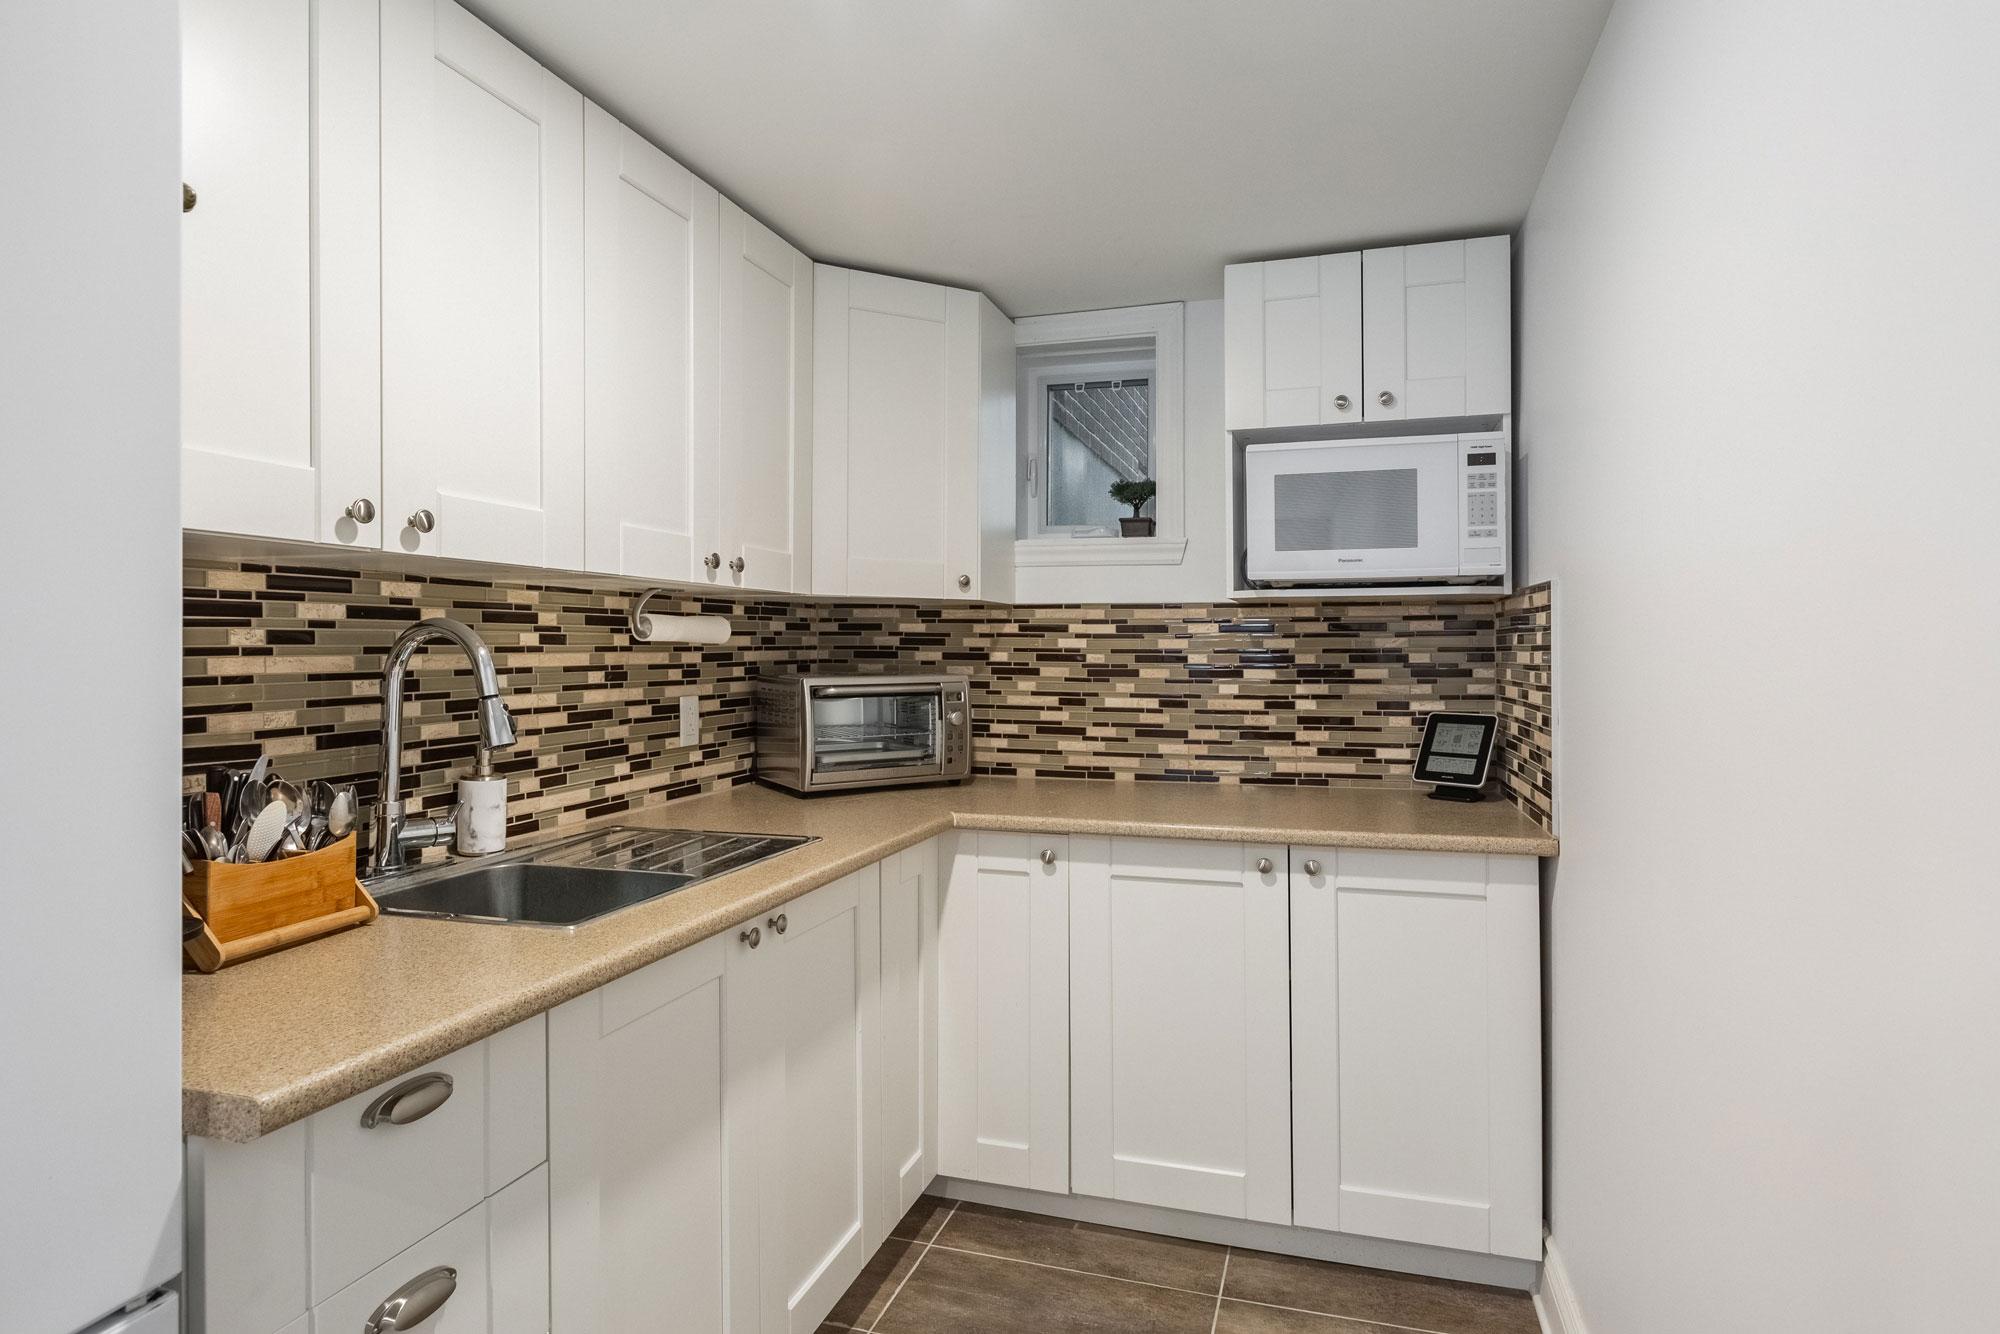 basement kitchen with white cabinets and ceramic backsplash